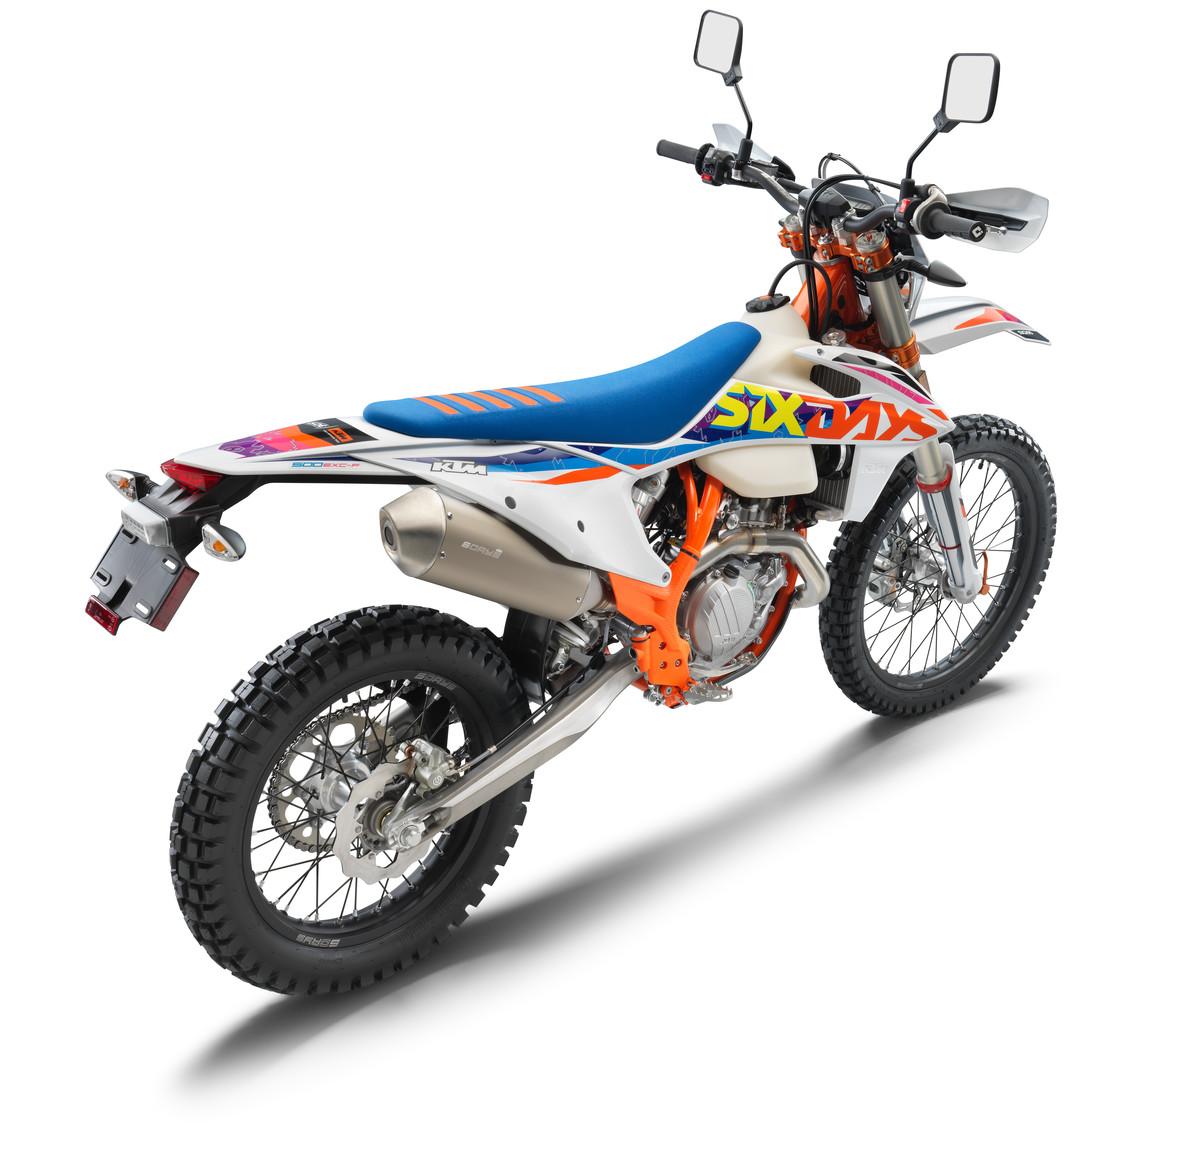 386936_500 EXC-F Six Days_US_rear ri_MY22